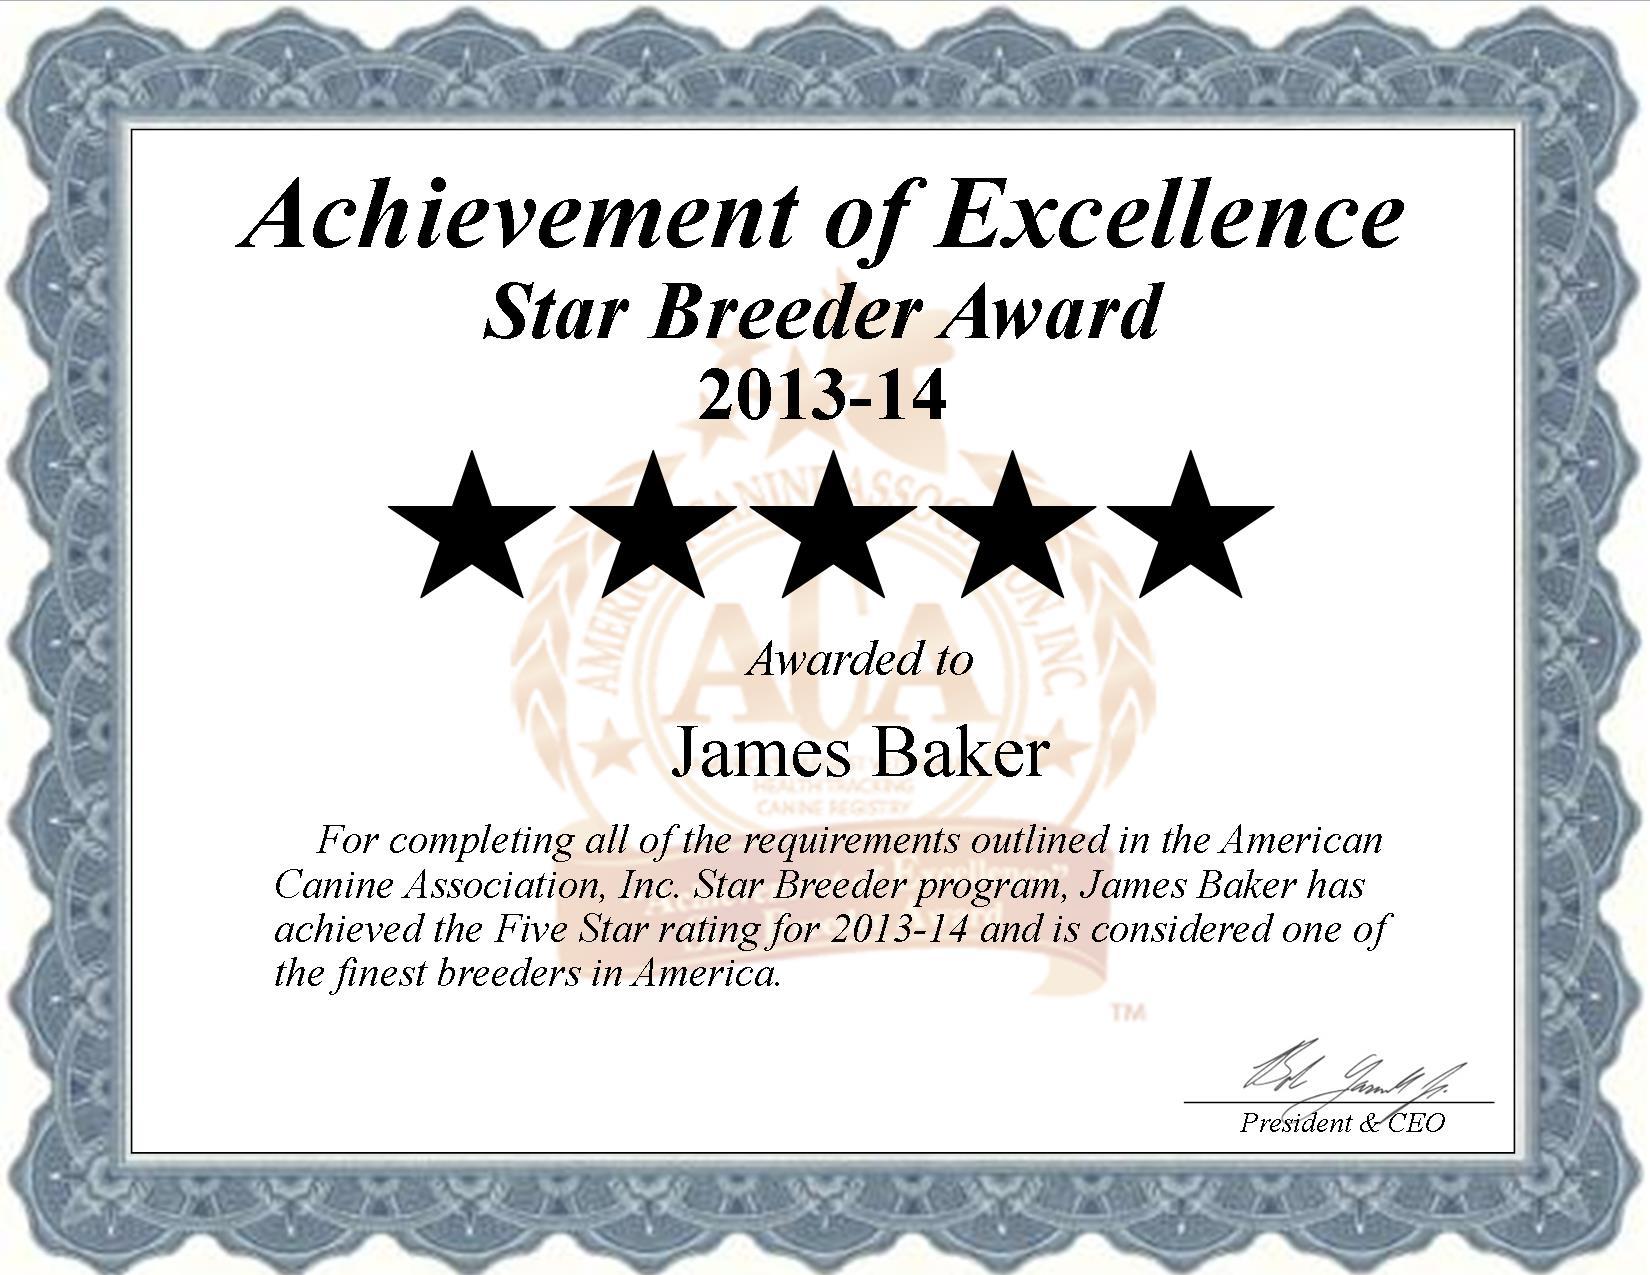 James, Baker, James Baker, Baker Kennel, breeder, star breeder, aca, star breeder, 2 star, ketchum, oklahoma, ok, dog, puppy, puppies;